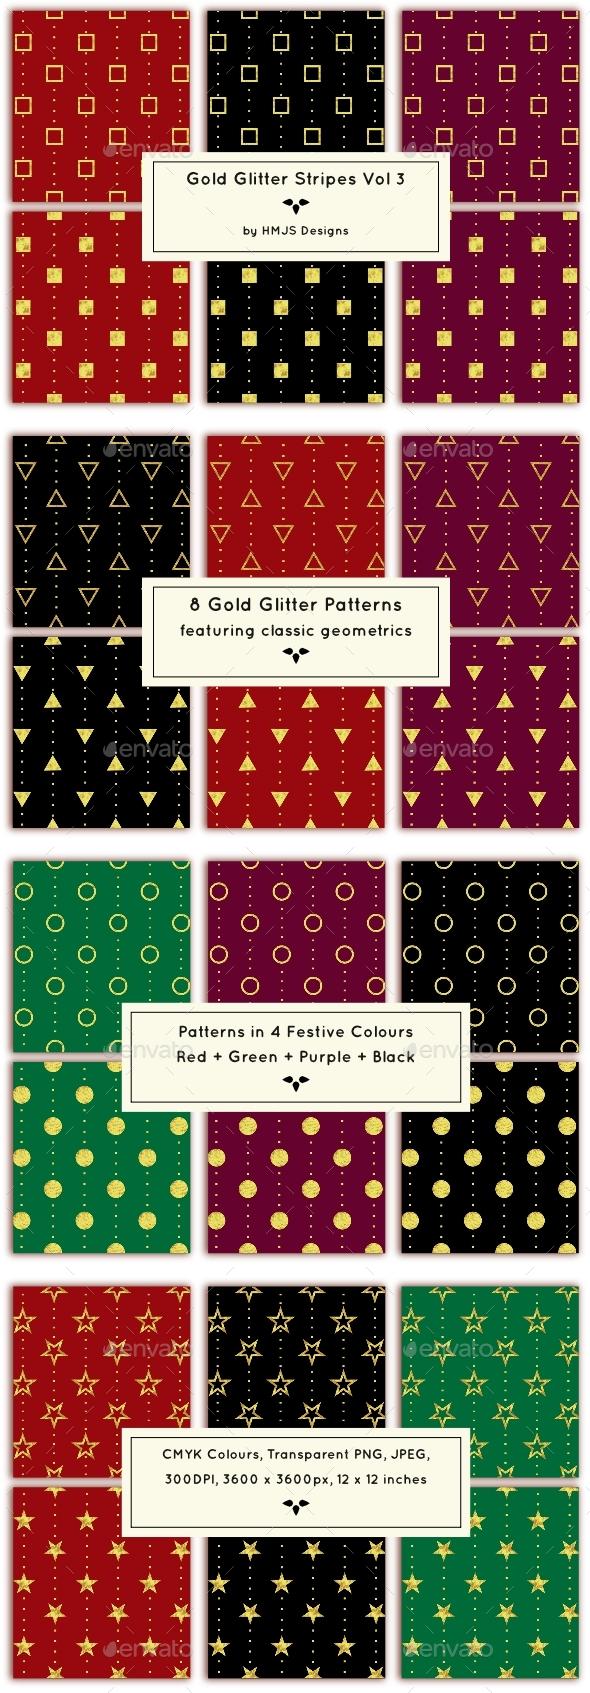 Gold Glitter Stripes Vol 3 - Patterns Backgrounds